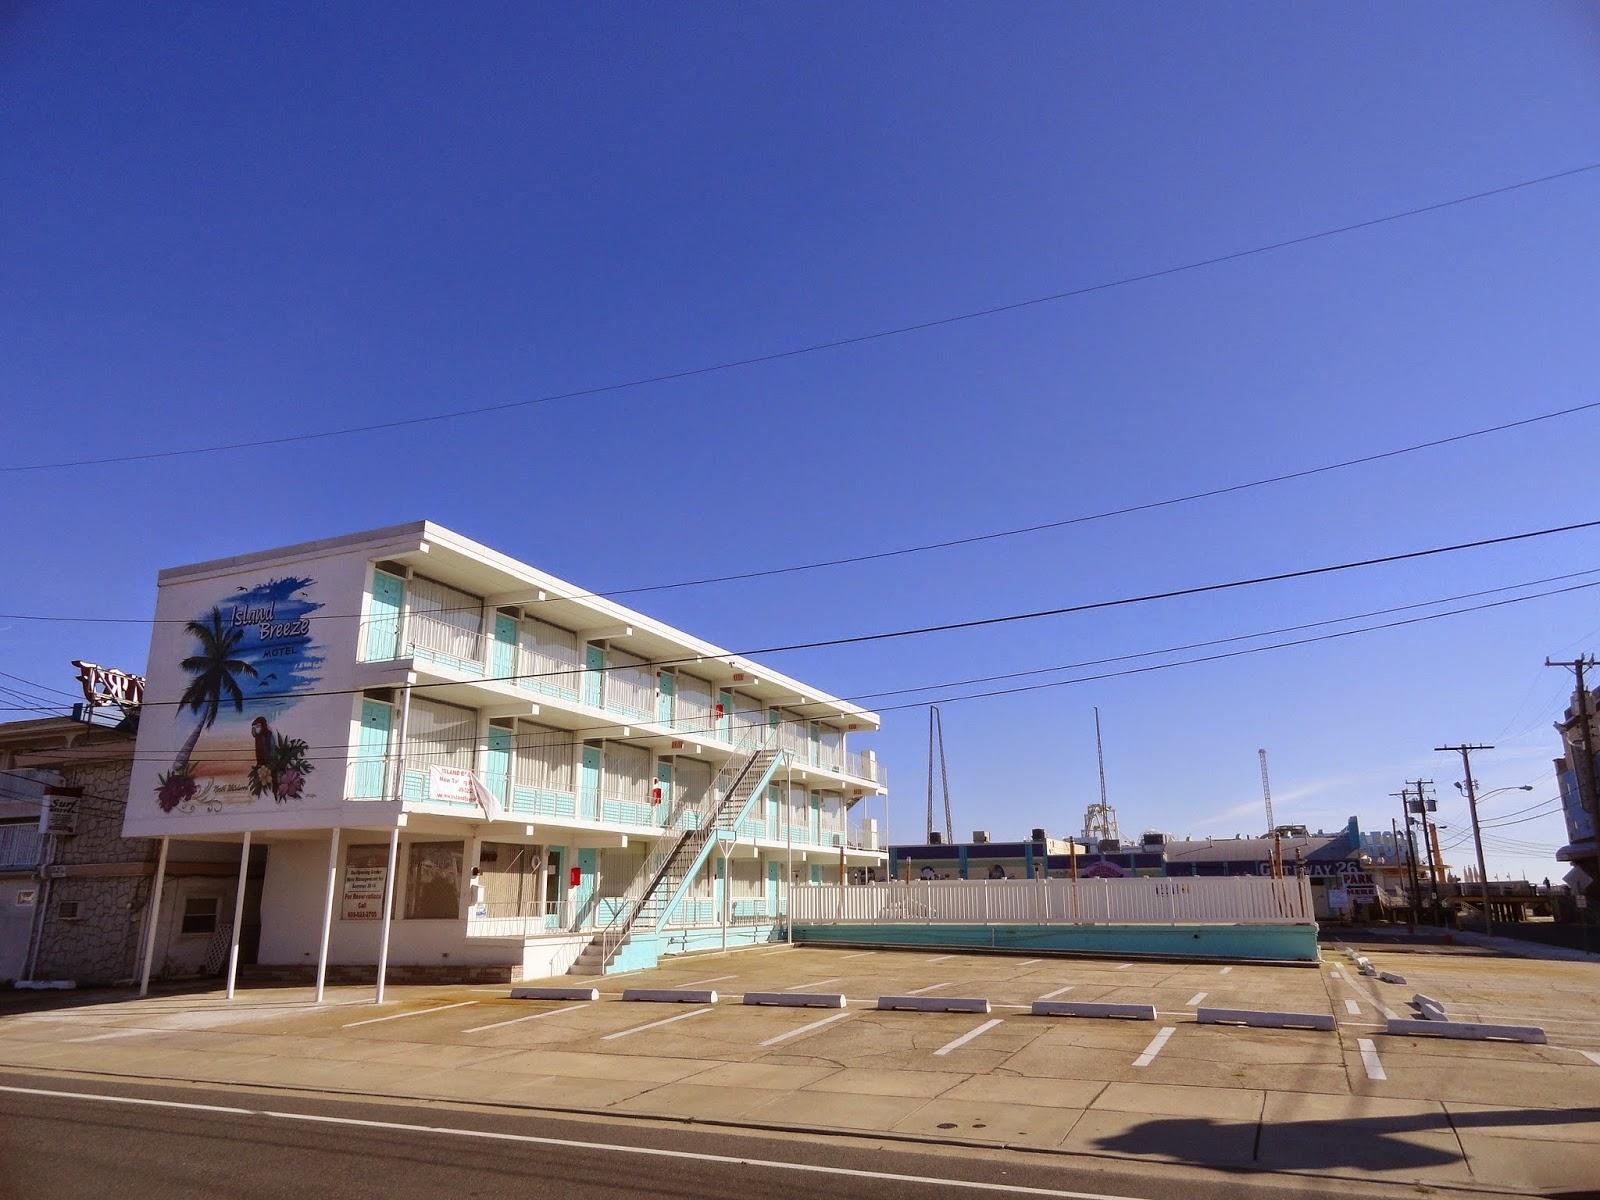 Wildwood weather february 2015 island breeze motel 26th surf the old avalon motel nvjuhfo Choice Image